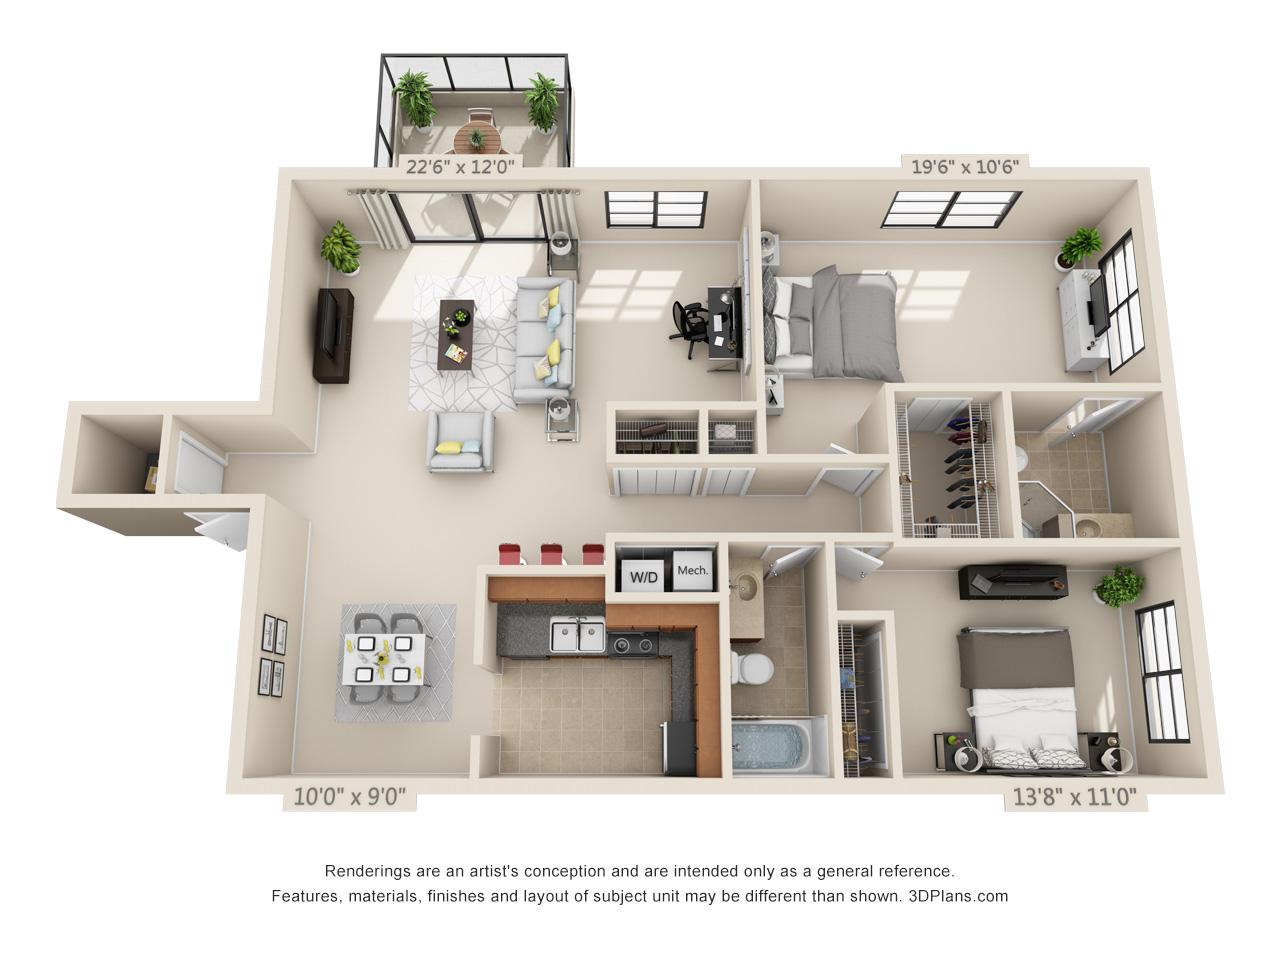 boca raton apartment rentals